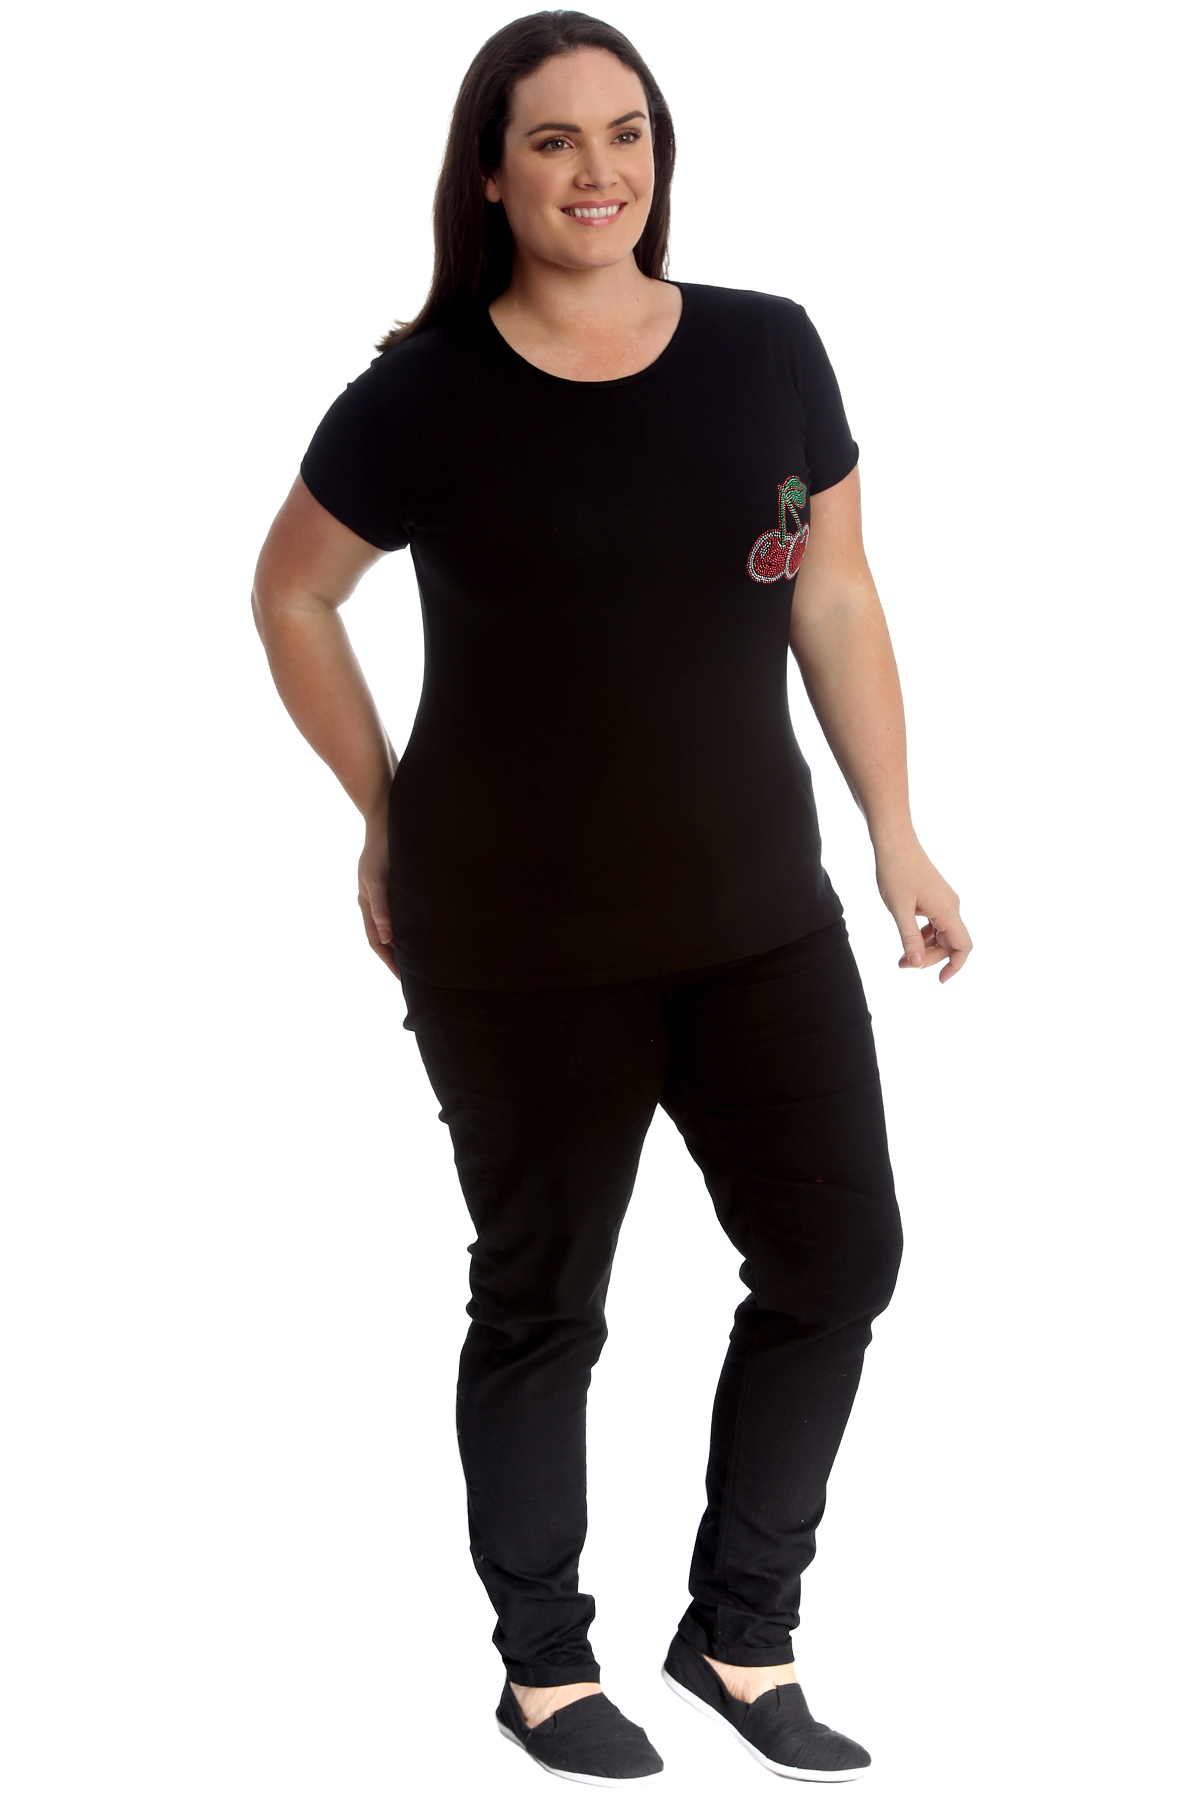 New-Womens-Plus-Size-Top-Ladies-Cherry-Rhinestone-T-Shirt-Soft-Stud-Shiny-Hip thumbnail 8